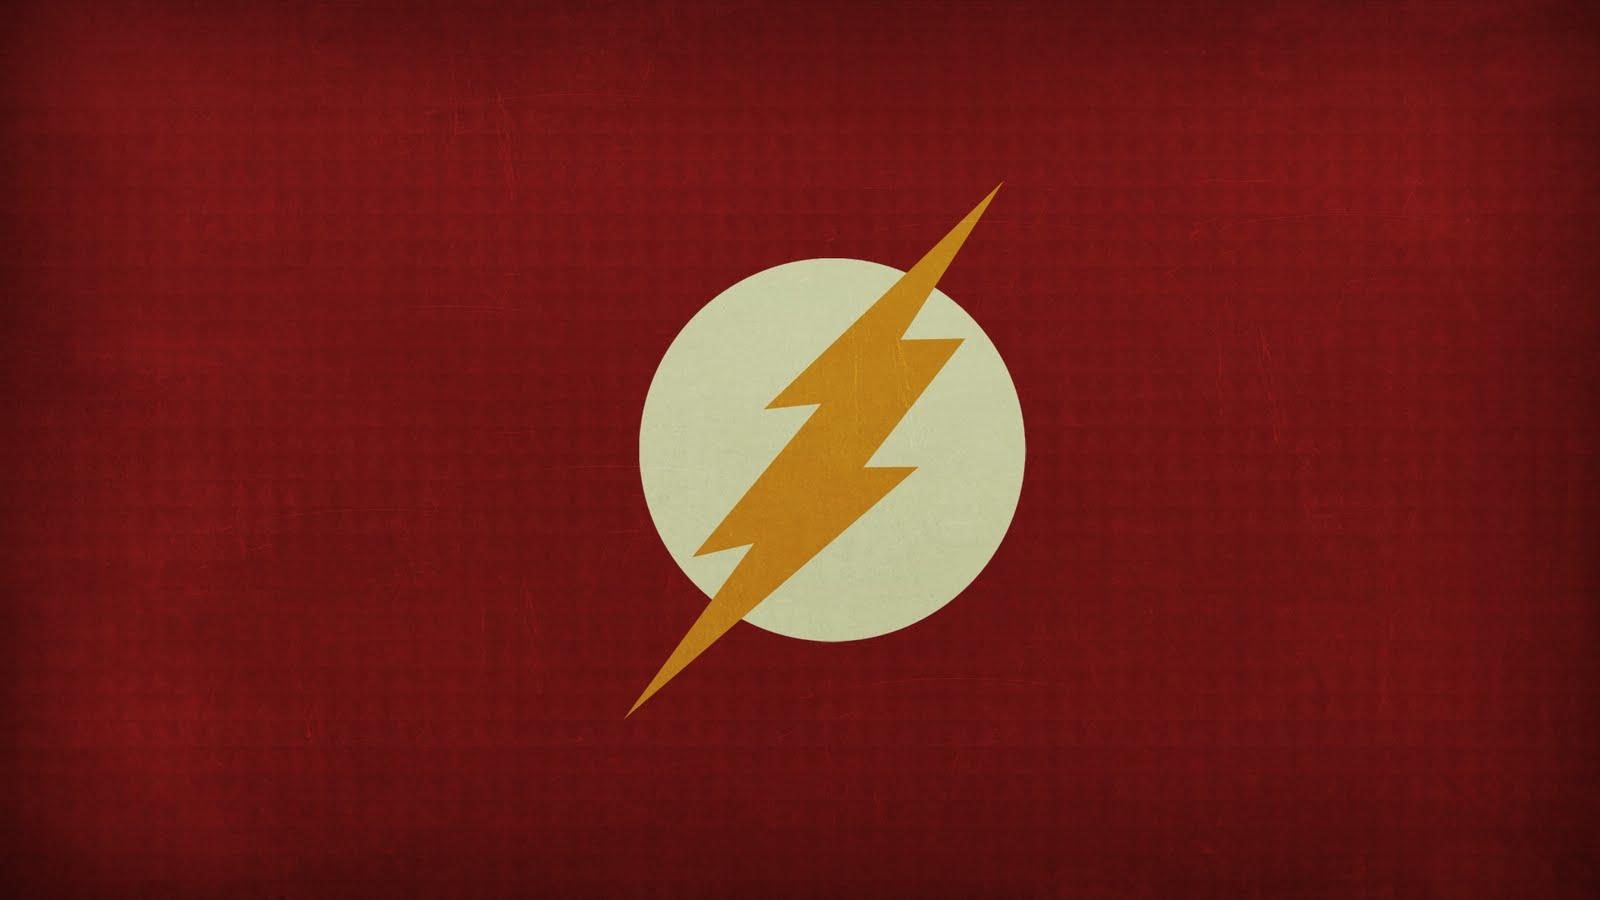 The Flash Logo Wallpaper Justice league wallpaper set 1600x900